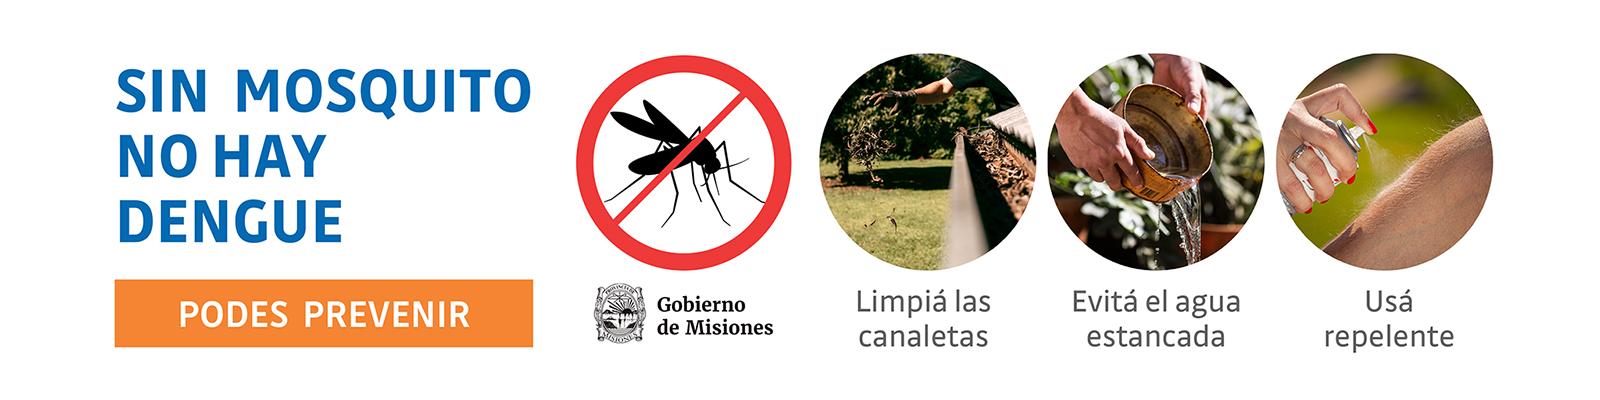 dengue-banner-web